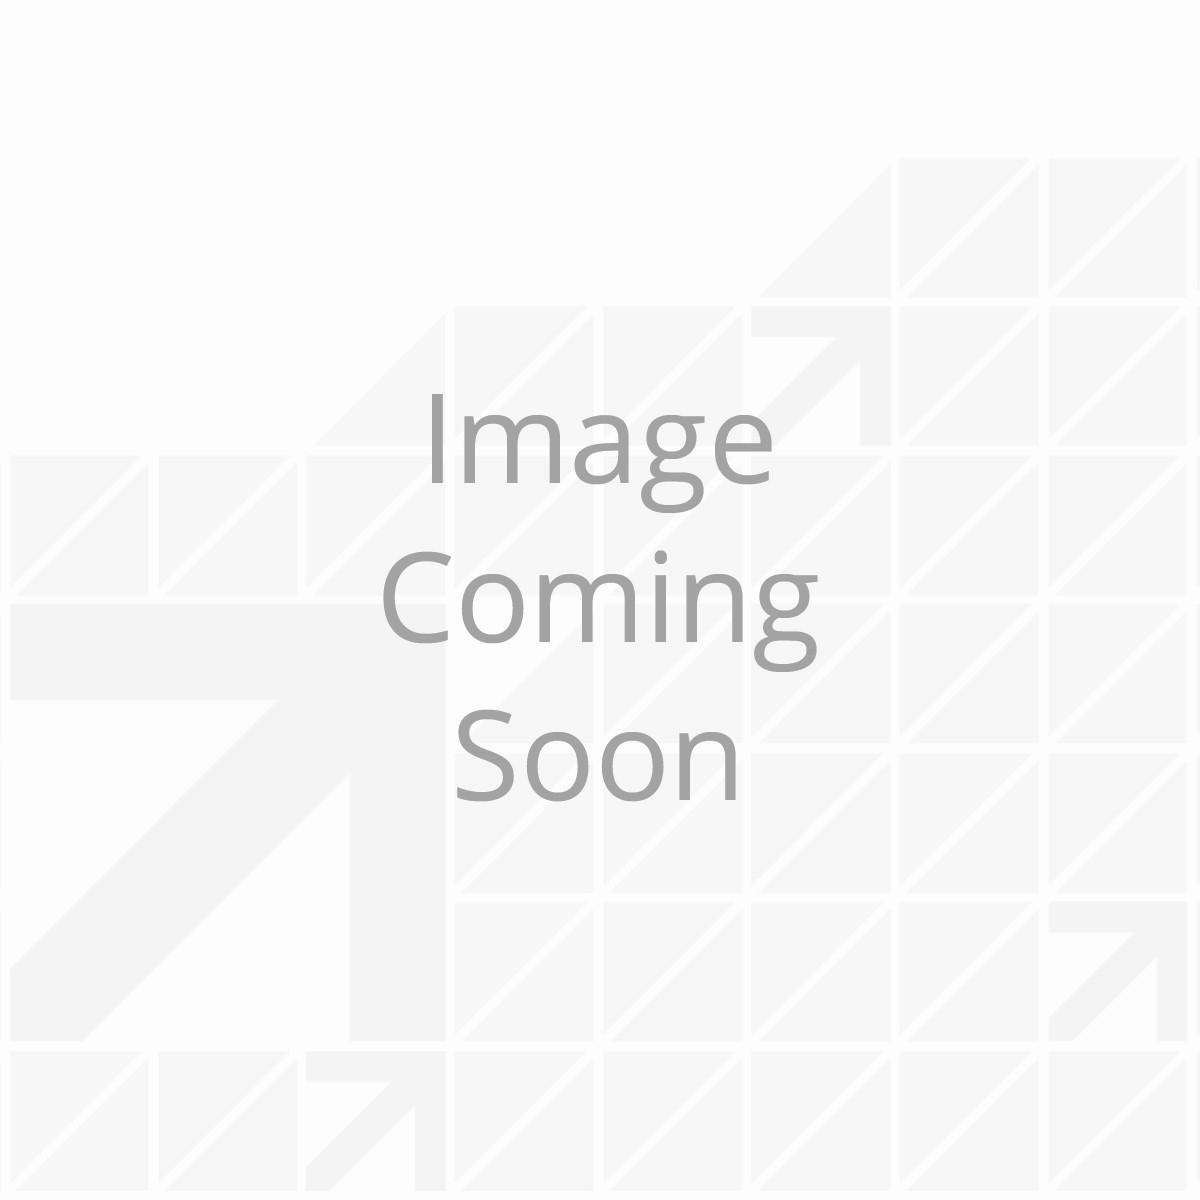 Standard Axle Hub - Dust Cap - Various Options